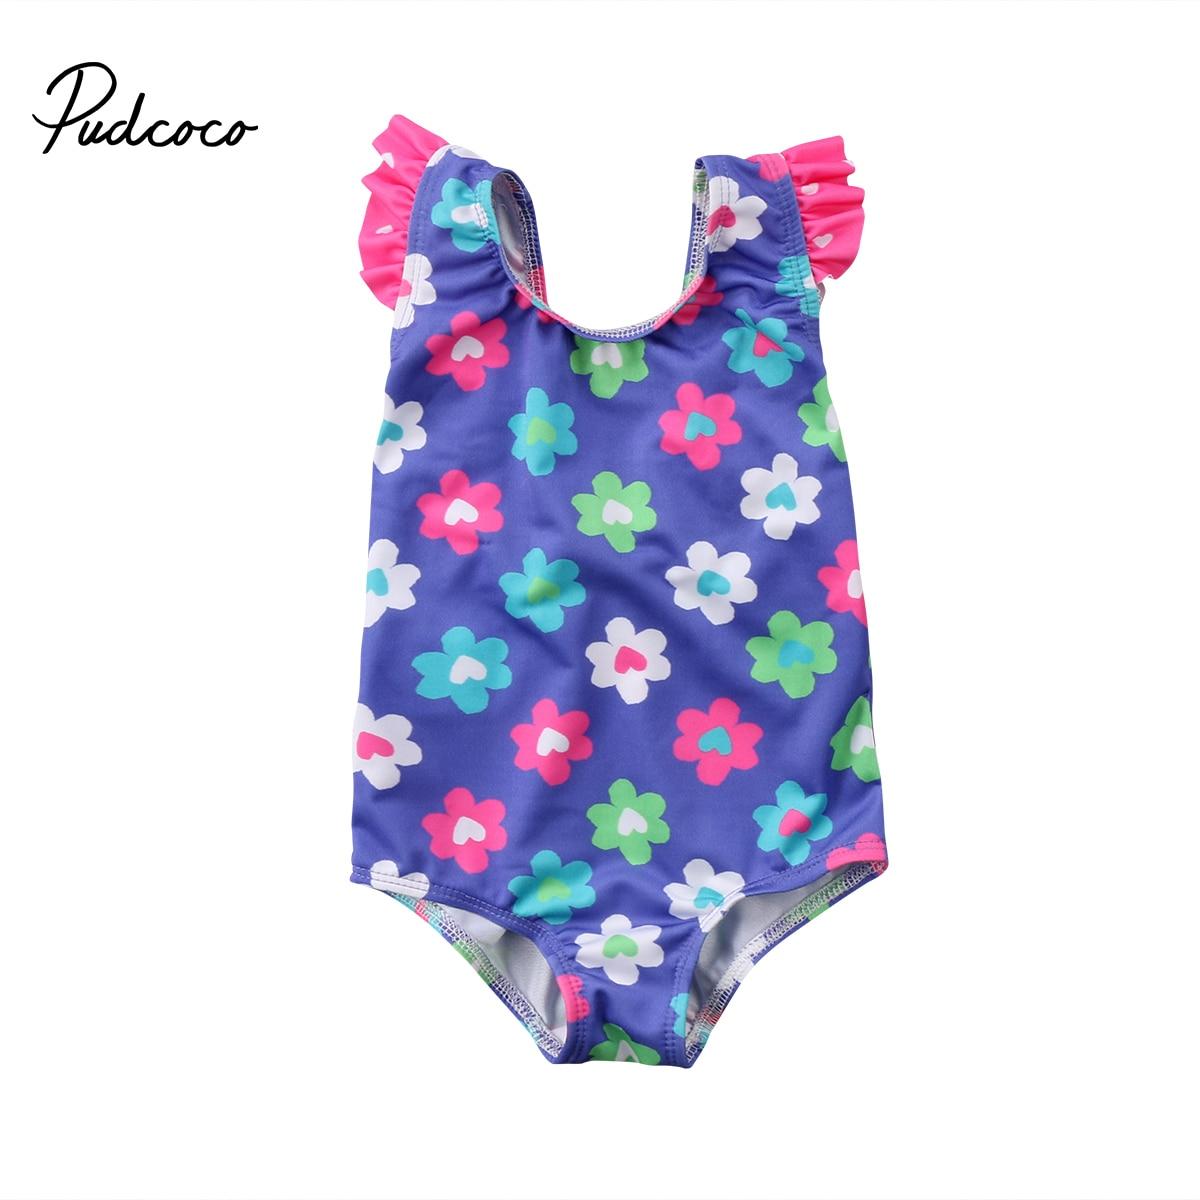 Fashion Summer New Kids Baby Girls Little Flower O-pieces Fly Sleeve Swimmer Bather Swimwear Pool Beach Summer